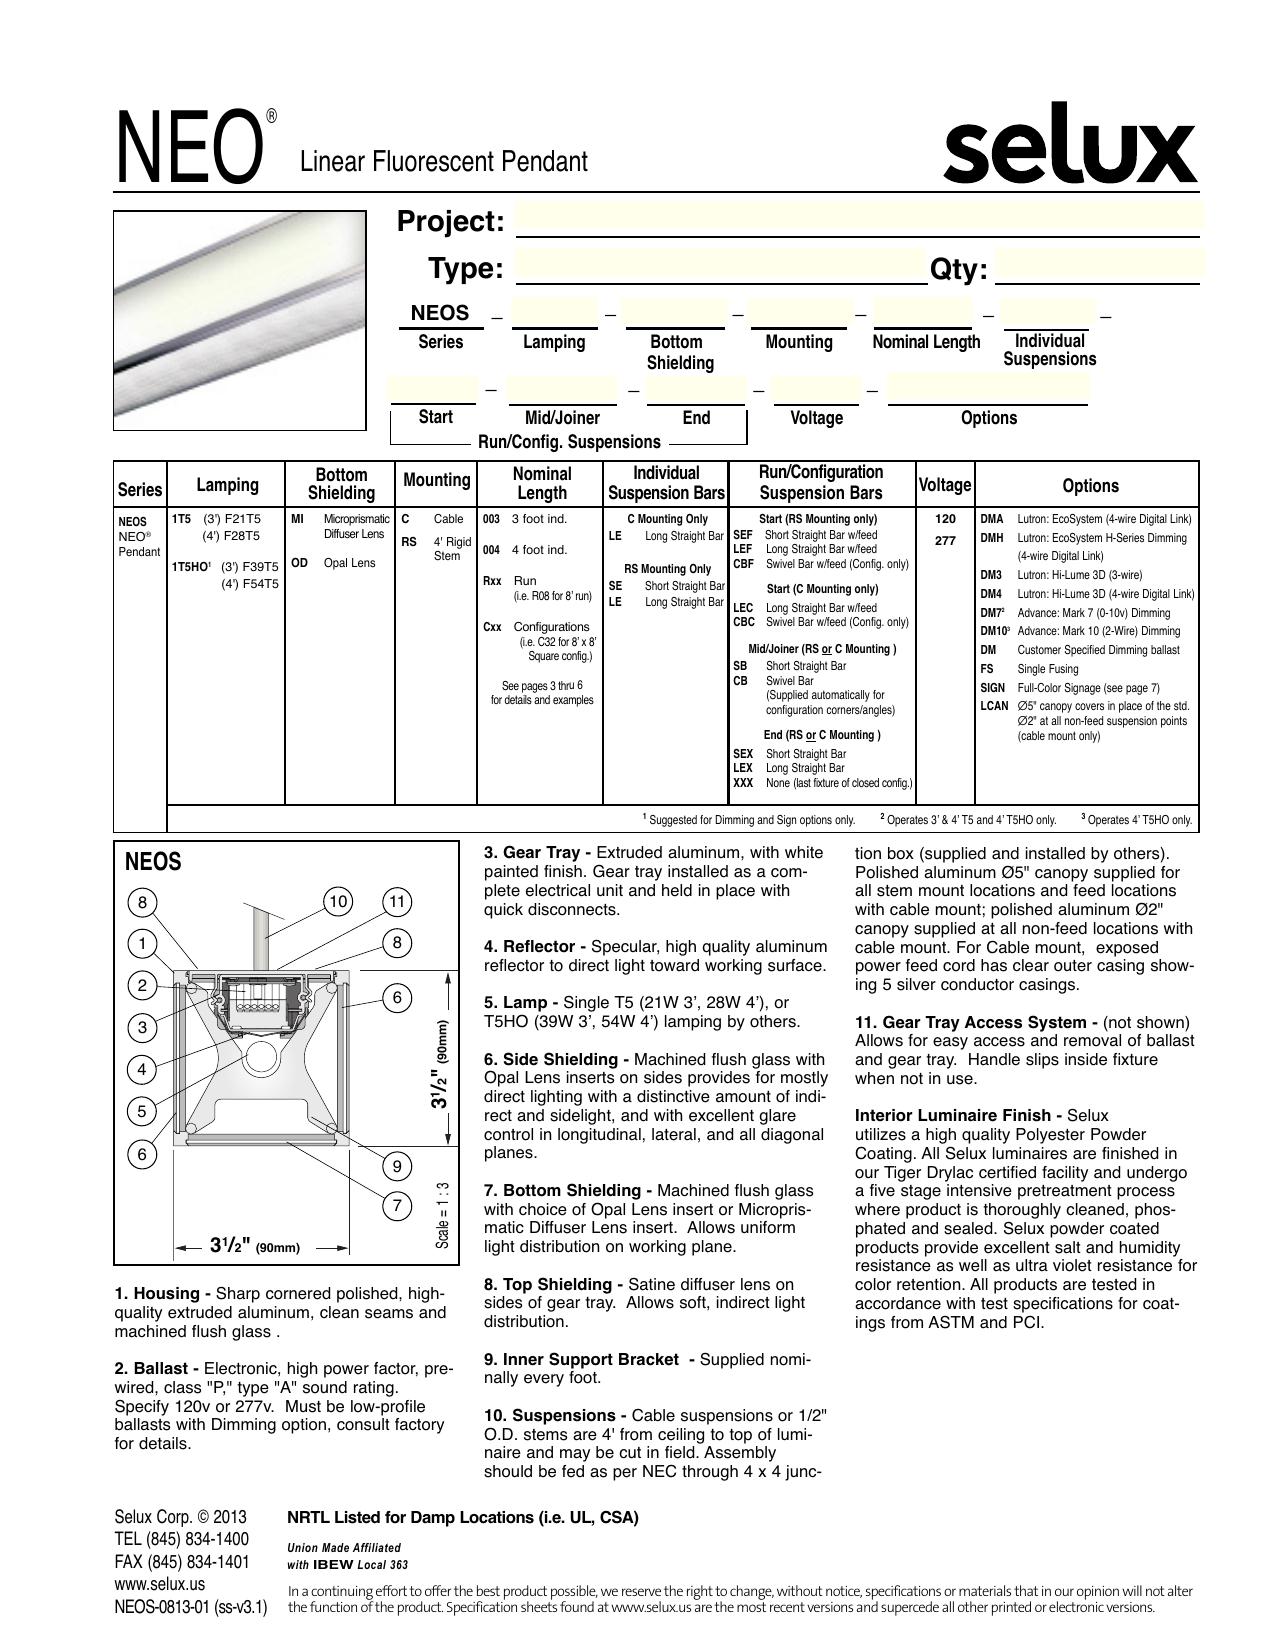 Neo Pendant Neos Seluxus F21t5 Ballast T5 Electronic Fluorescent 1 Or 2 Lamp 120v 277v 21w